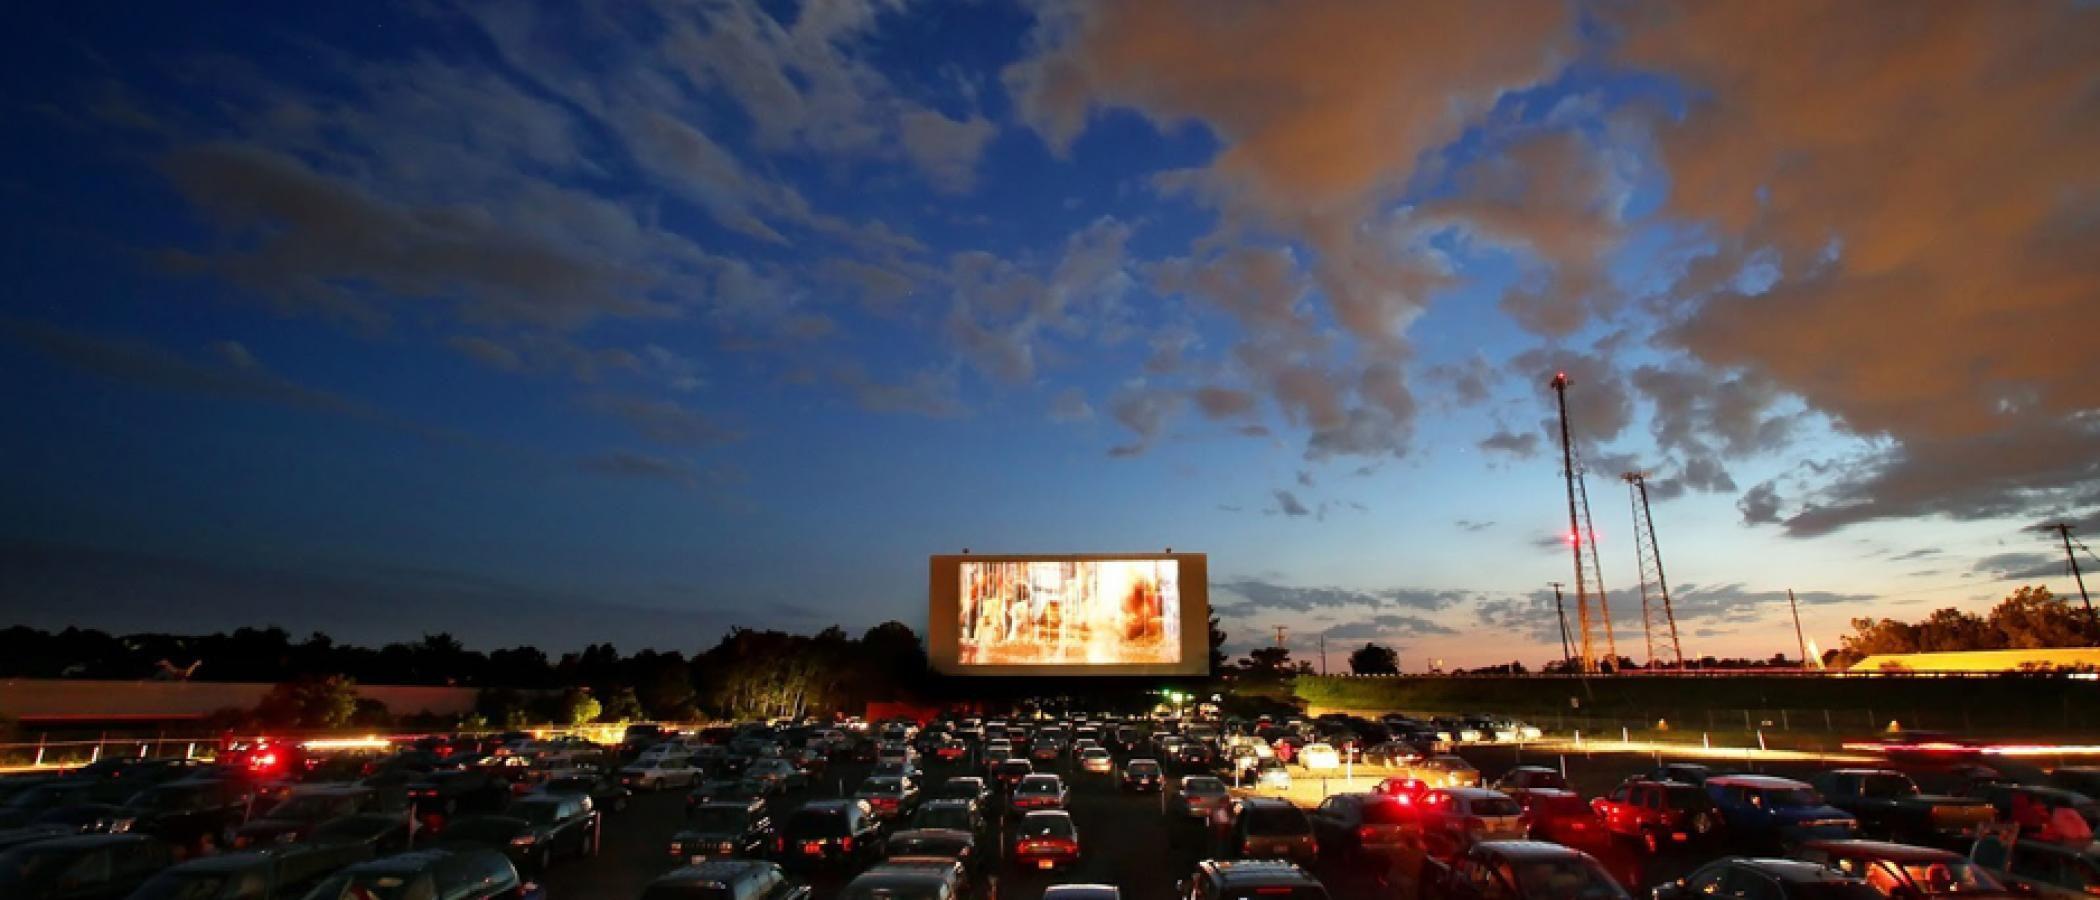 DriveIn Movie Theatres in Ohio Drive in movie theater